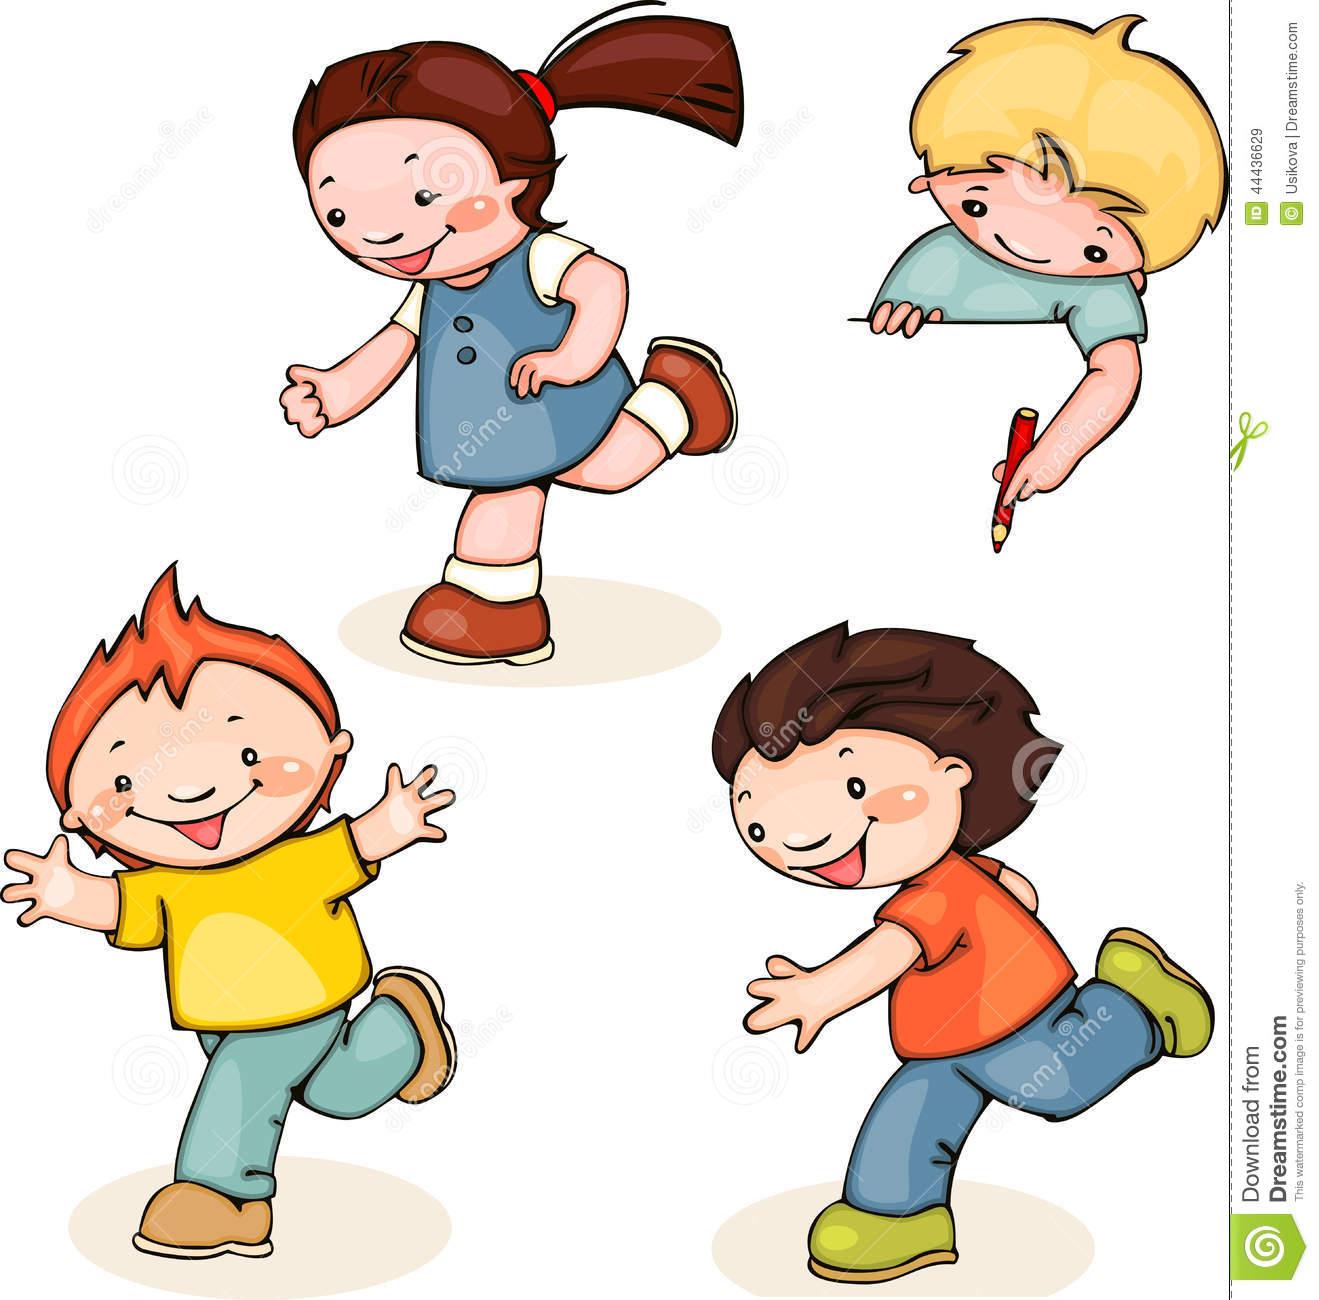 Athletic clipart fun run. Running child clip art